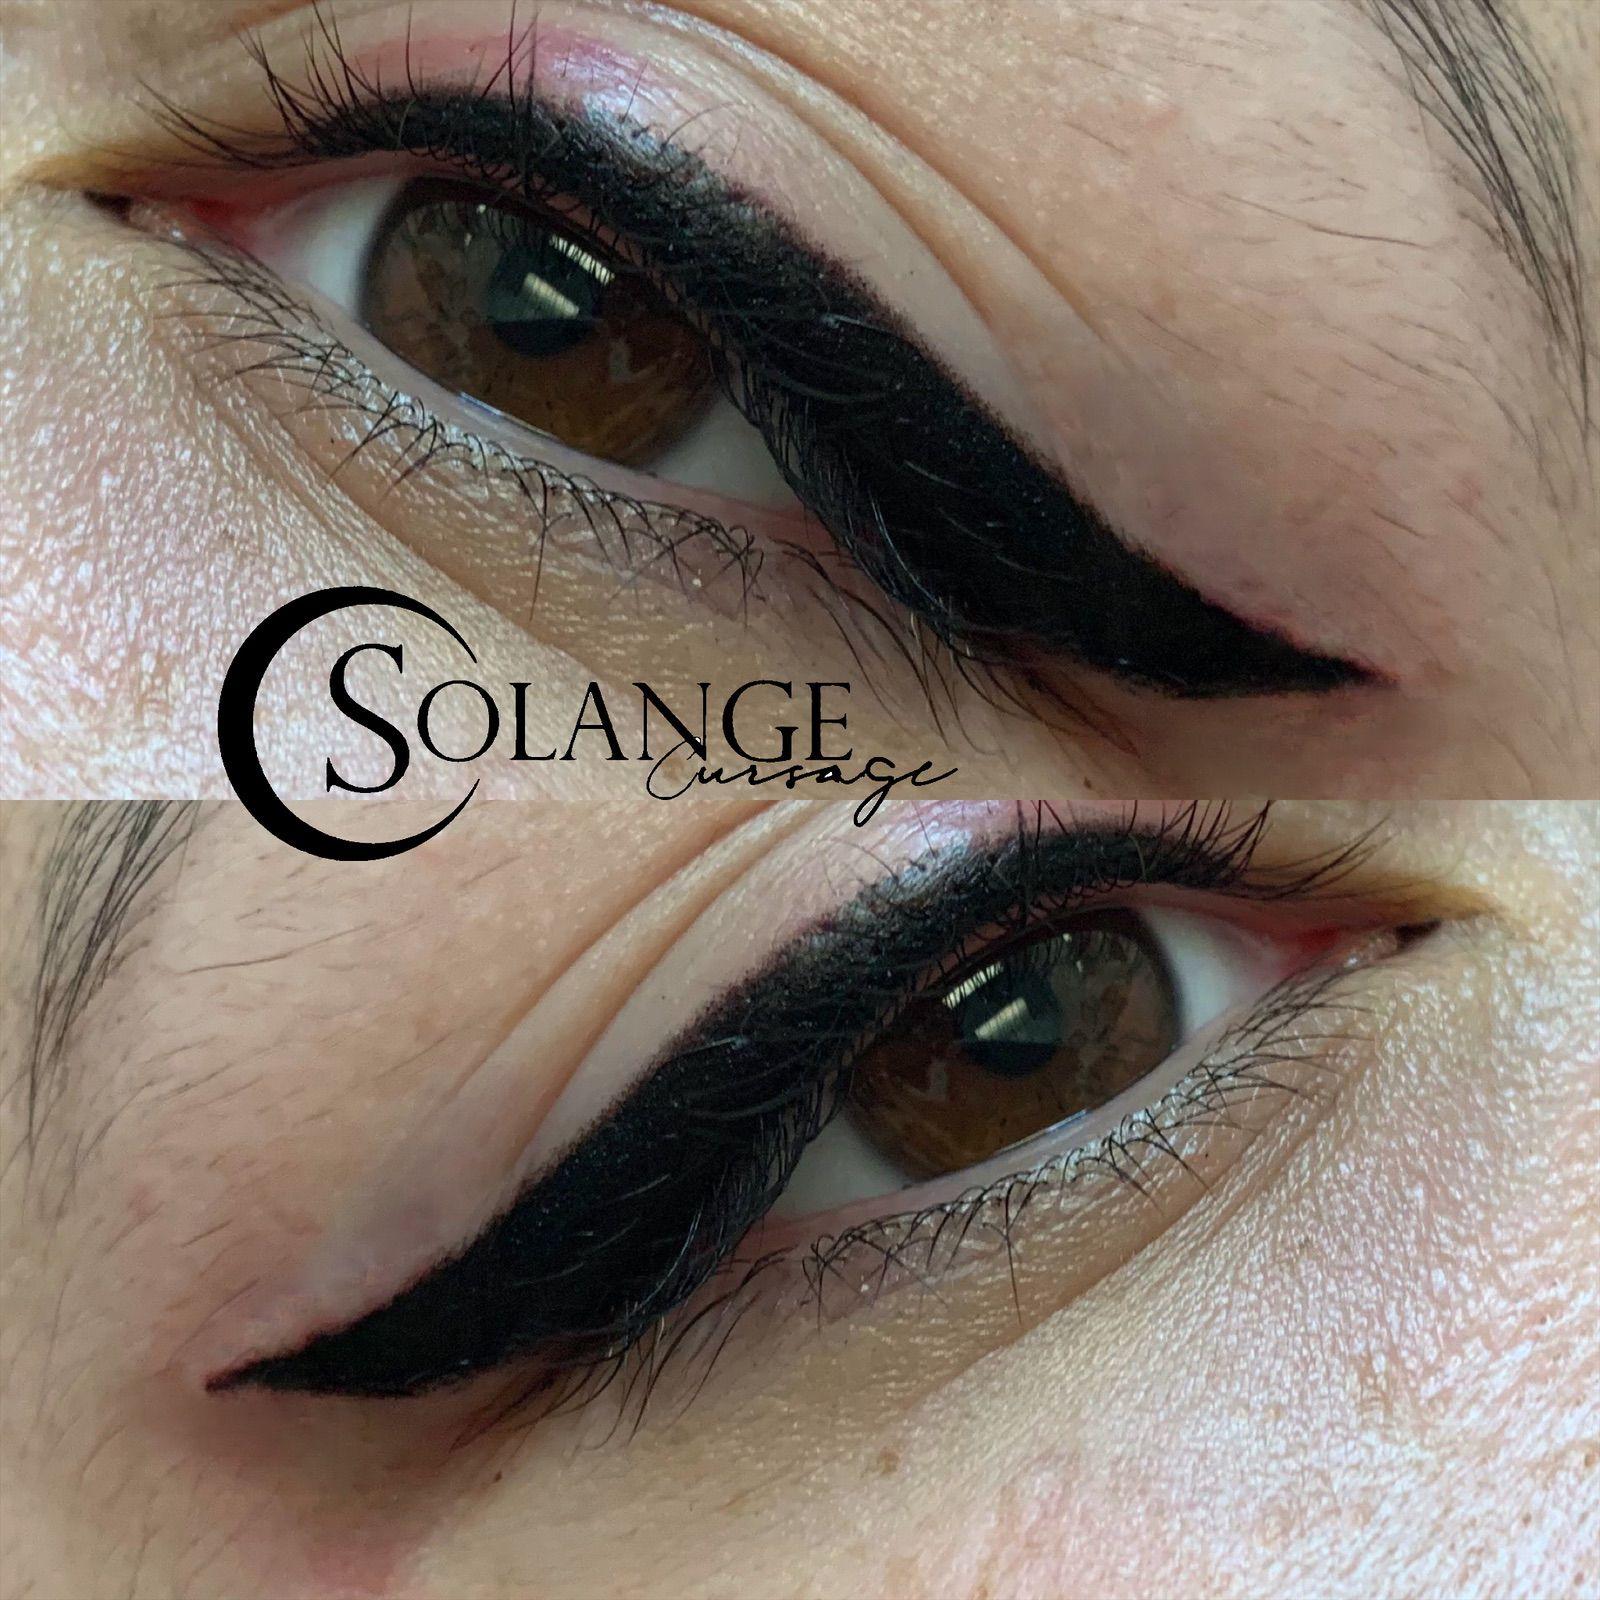 Permanent makeup tattooing Permanent makeup, Eyeliner